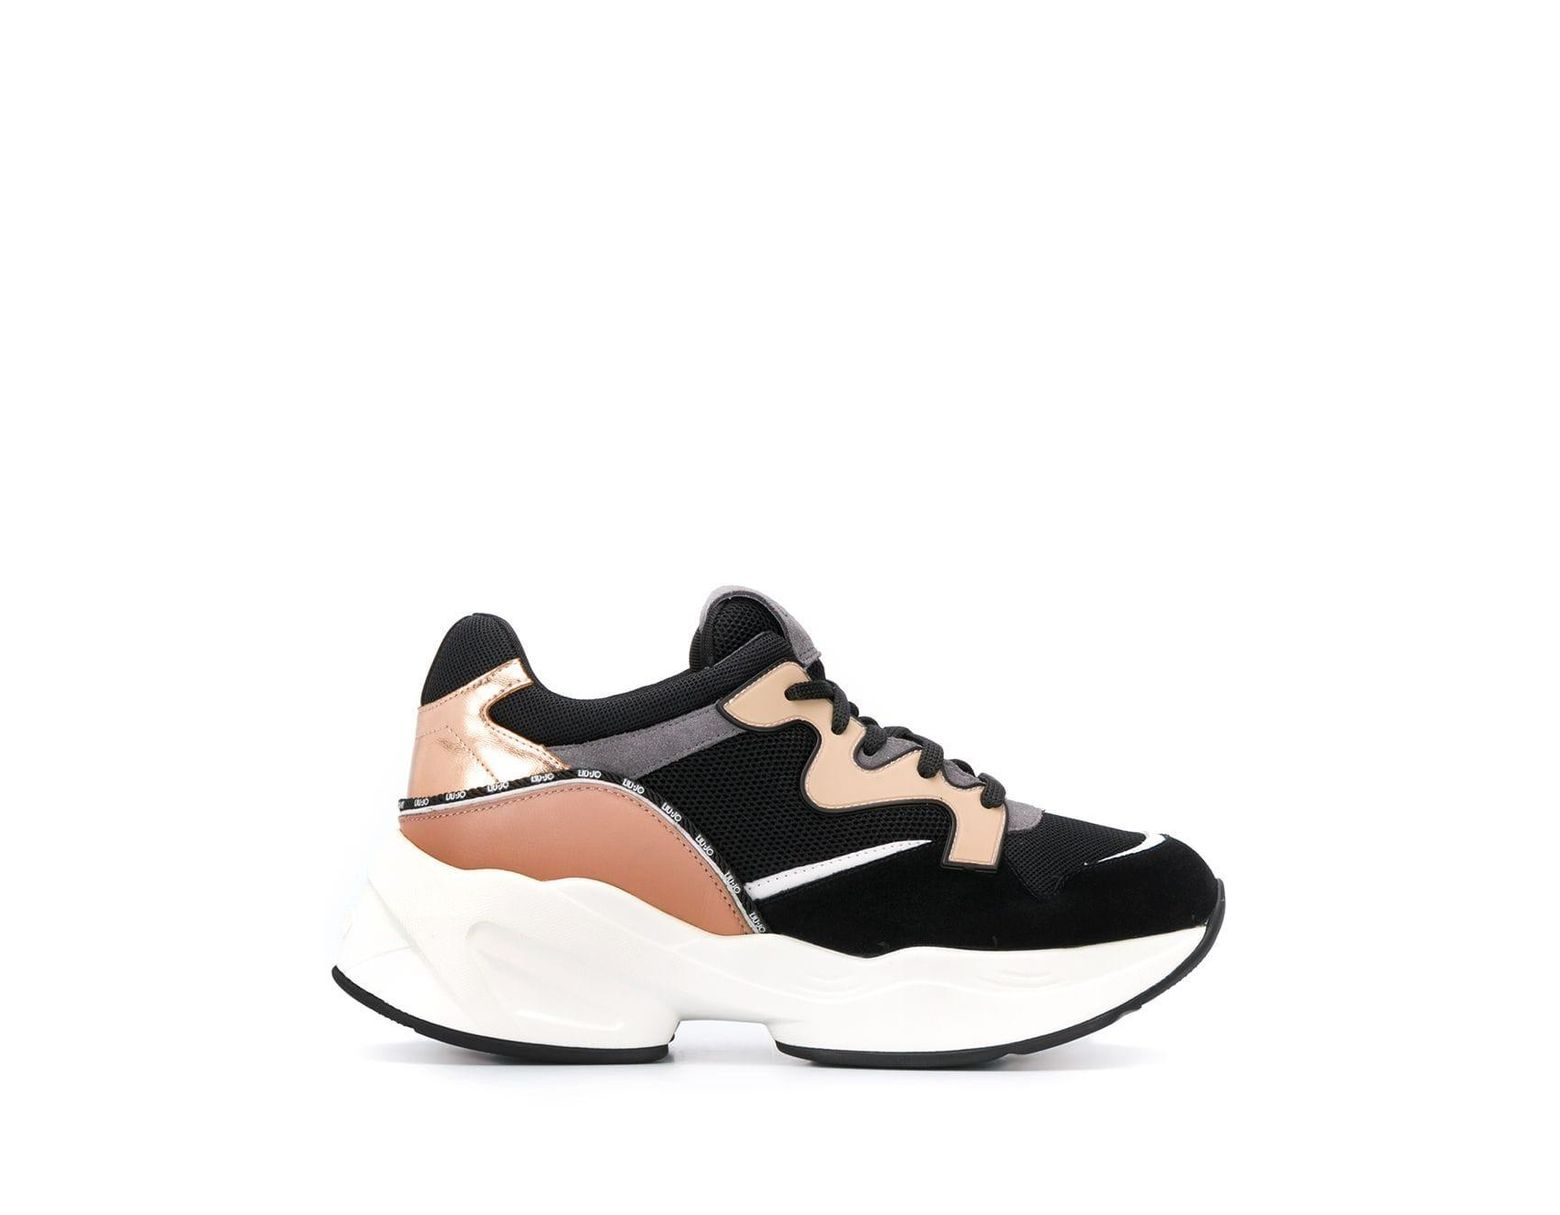 detailed look 42c88 1e395 Men's Black Low-top Running Sneakers